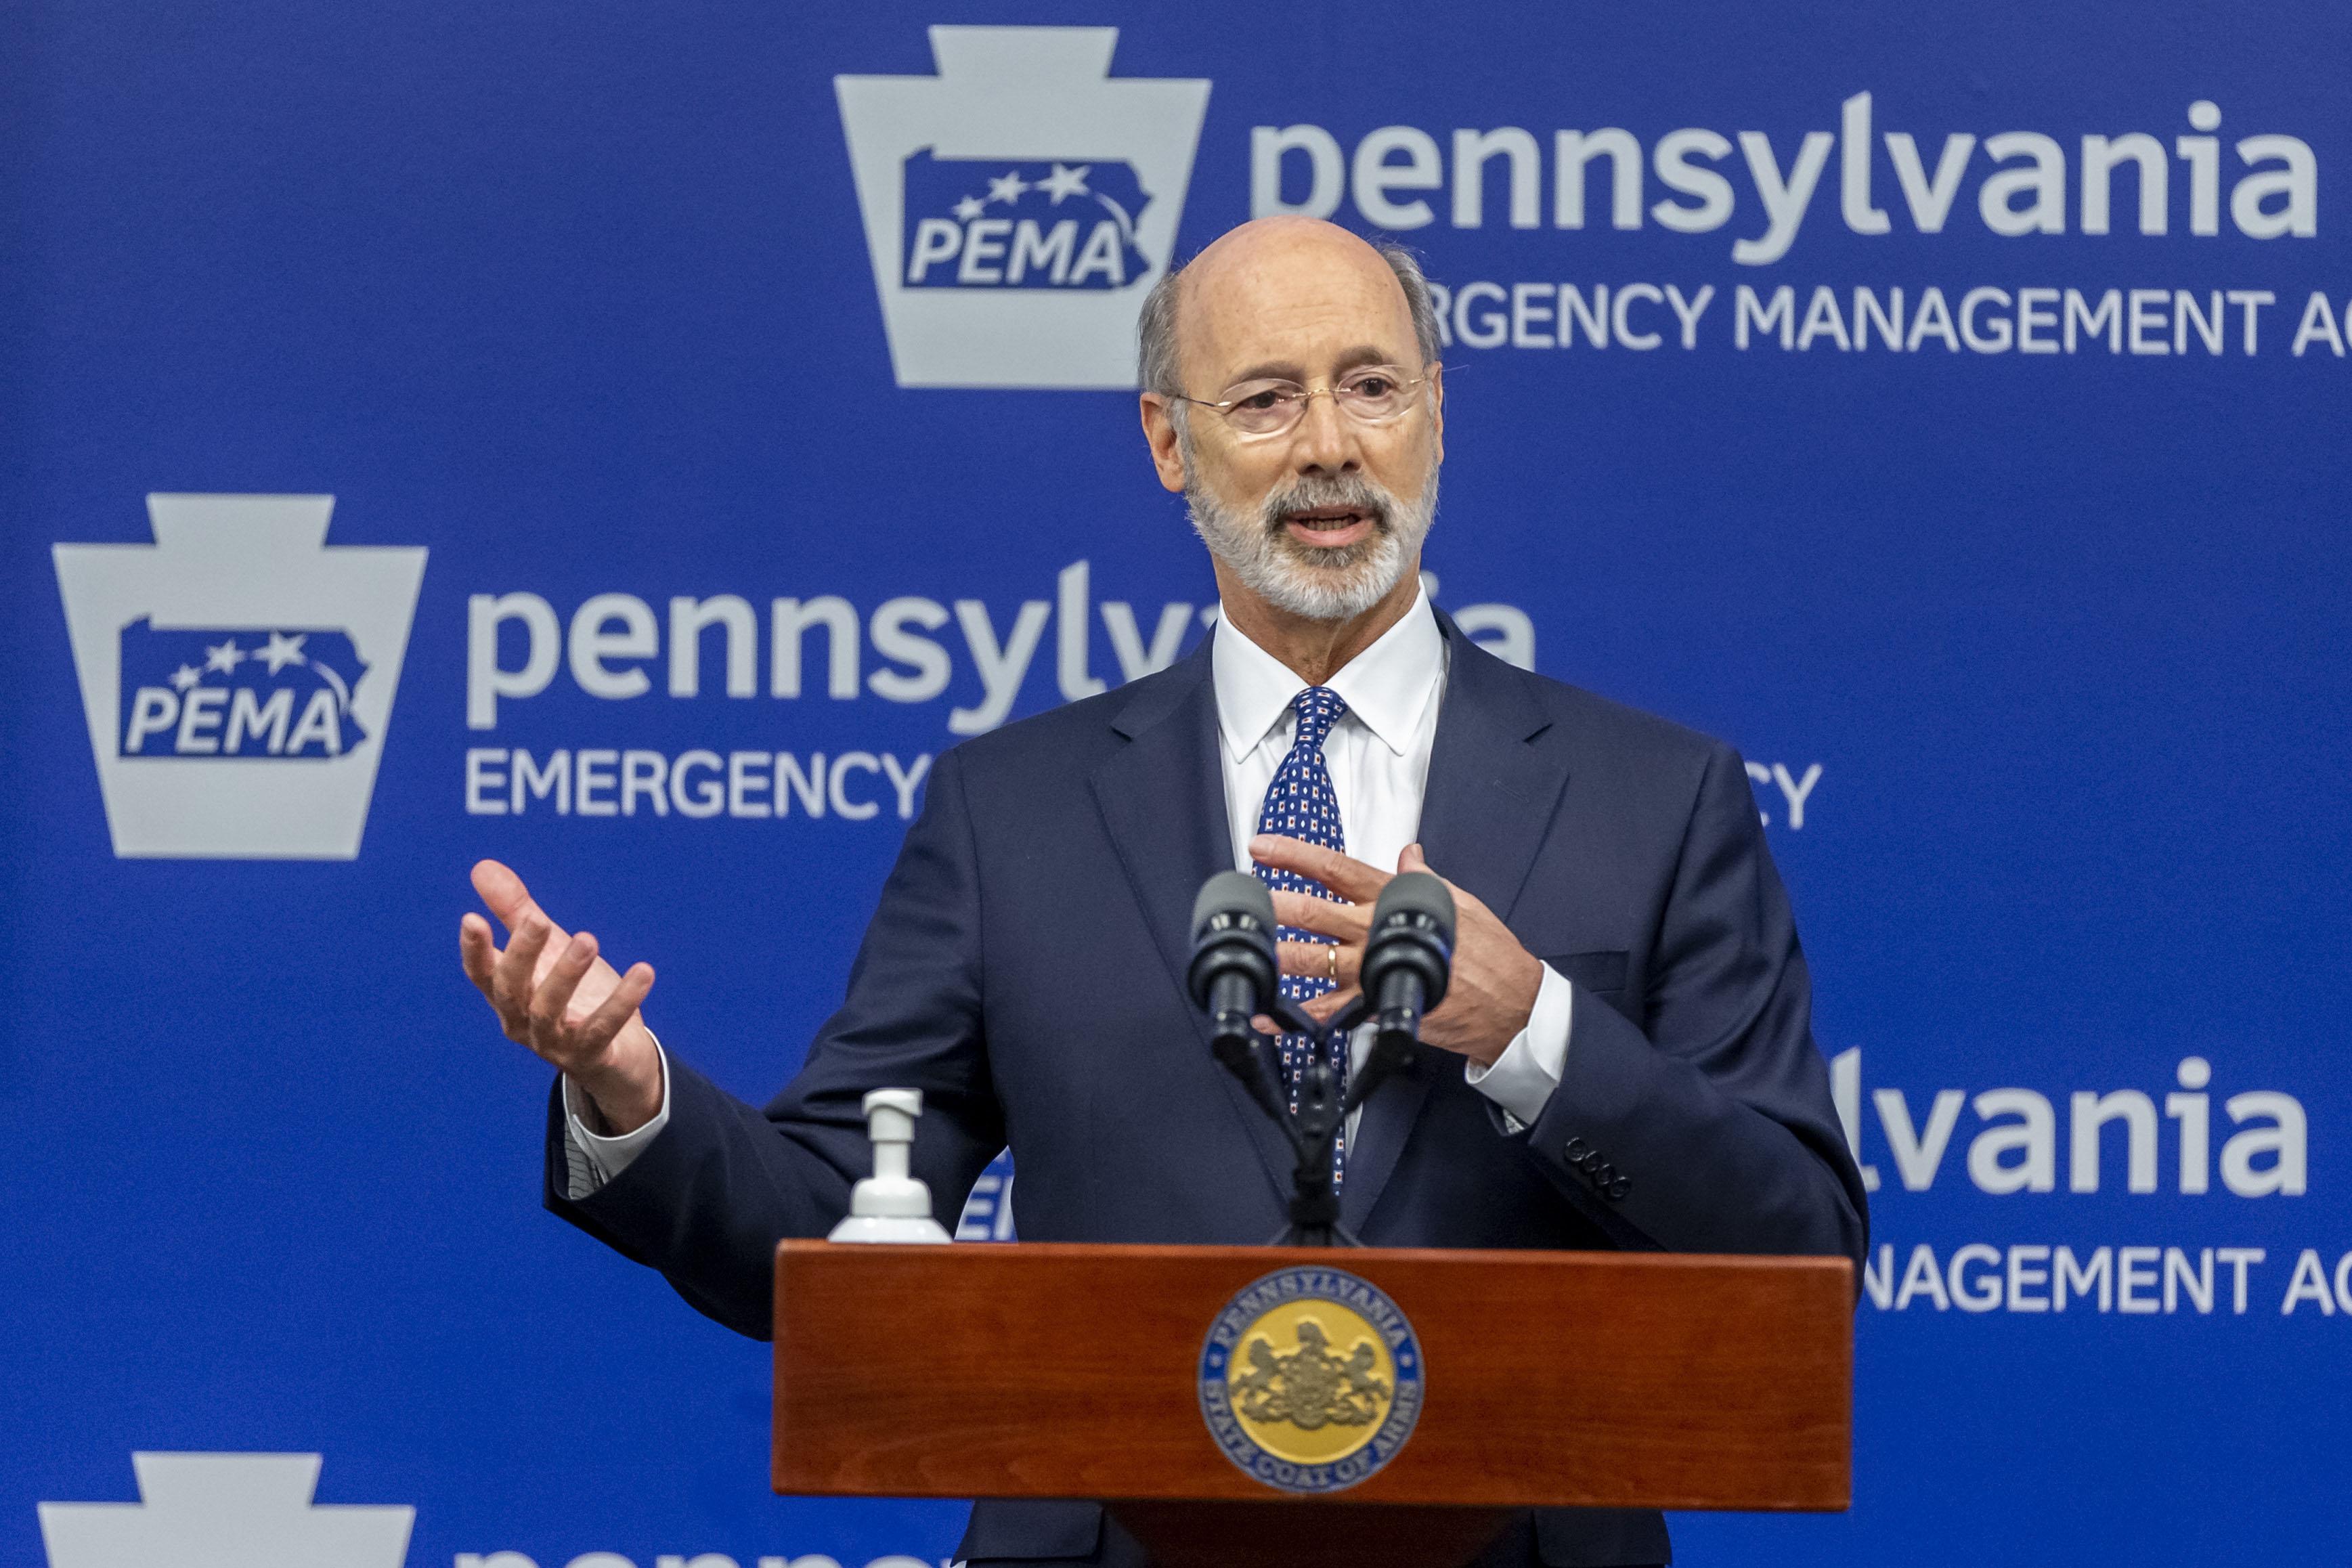 PennsylvaniaGov. Tom Wolf speaks with the media in Harrisburg, Pennsylvania, on May 29.